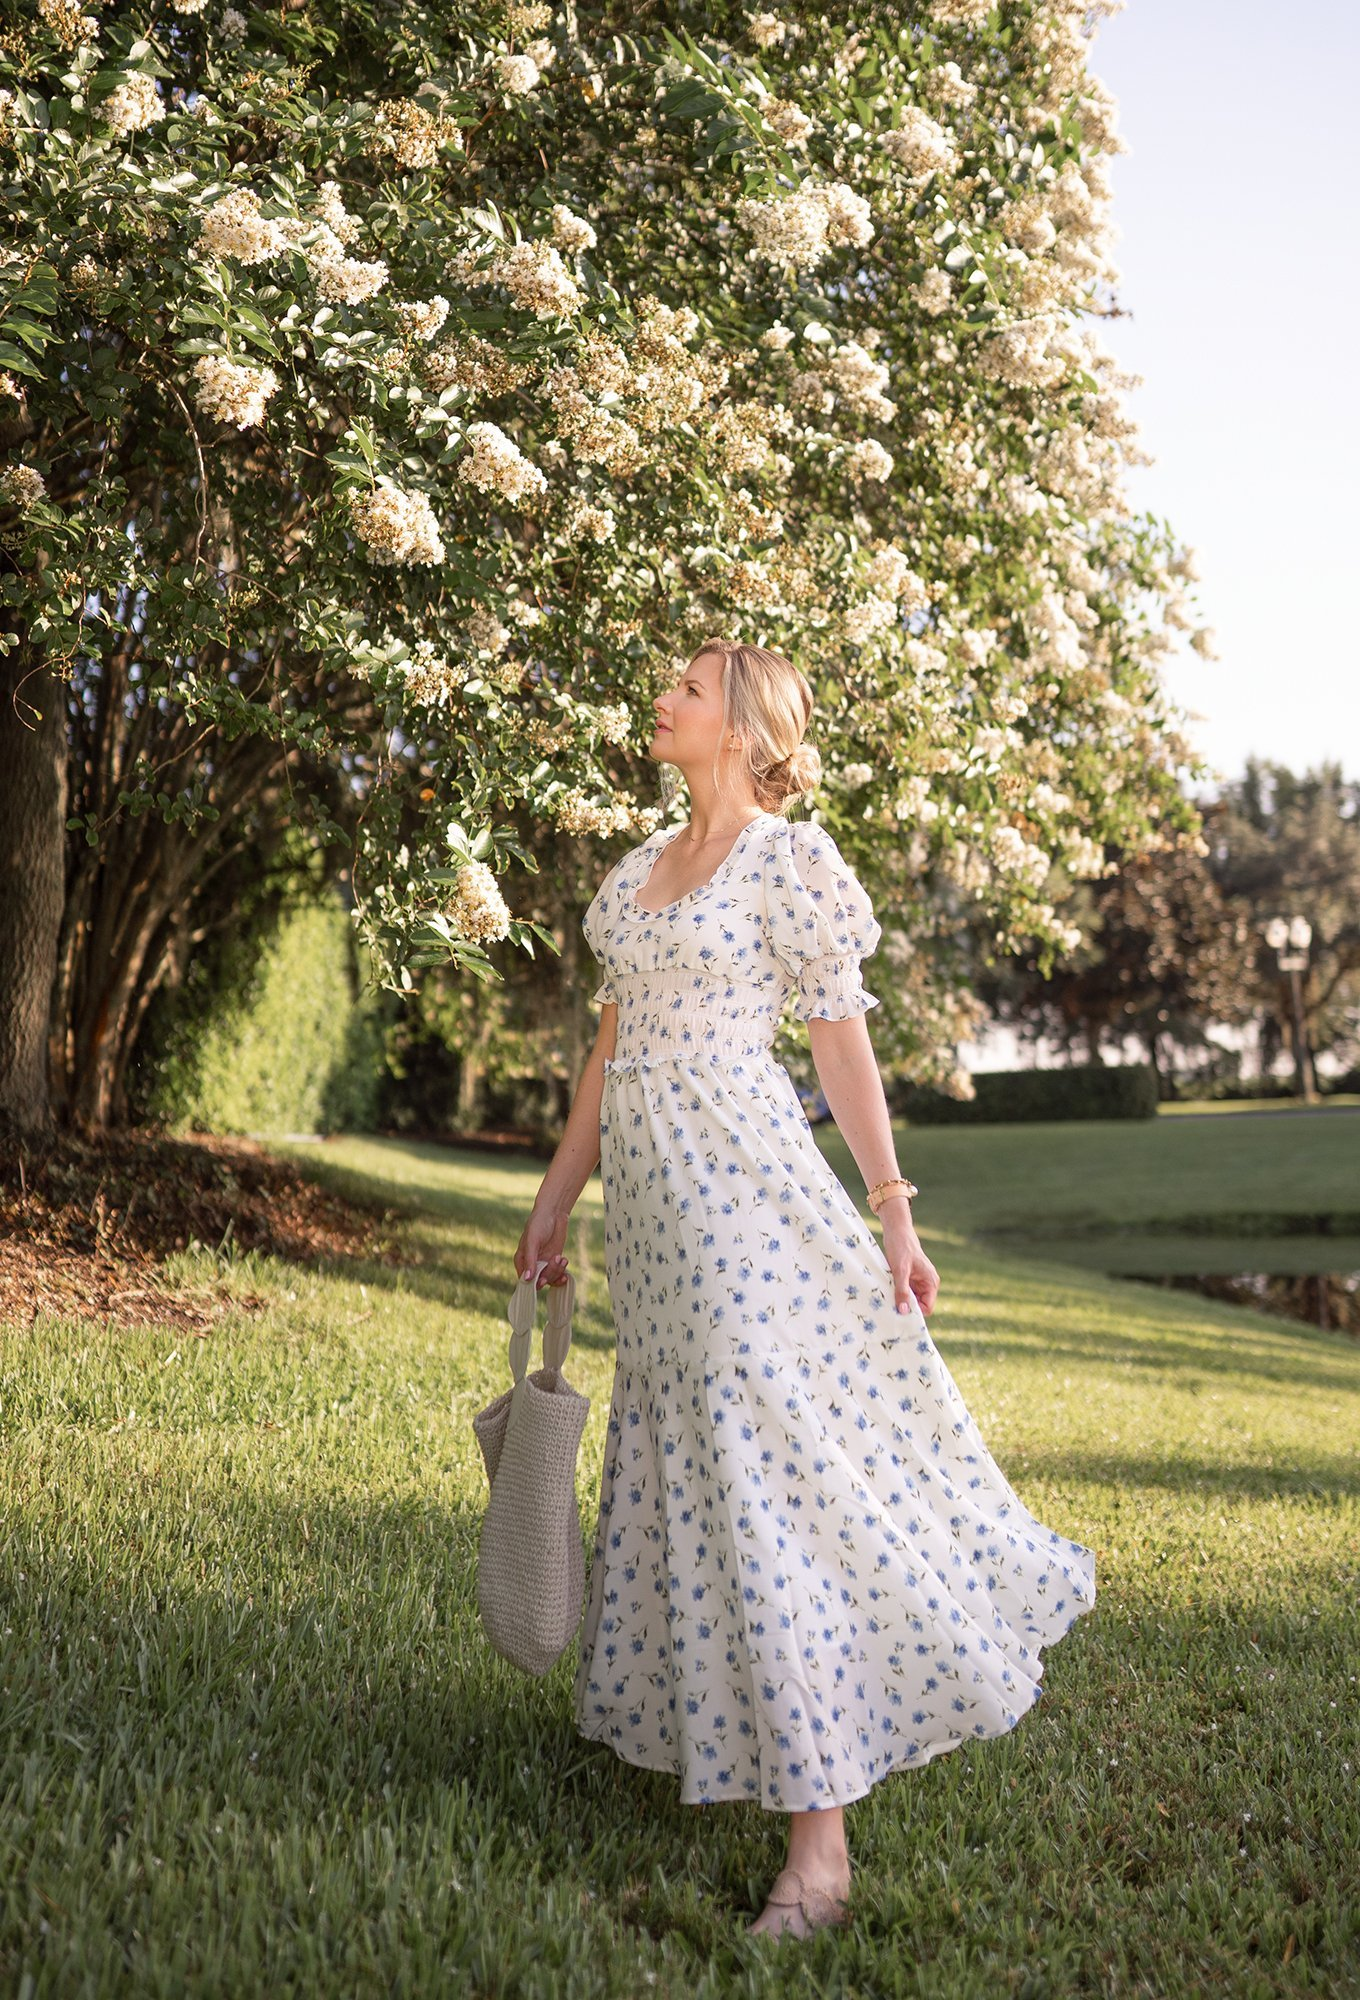 Ashley Brooke wearing Sister Jane blue & white bow dress